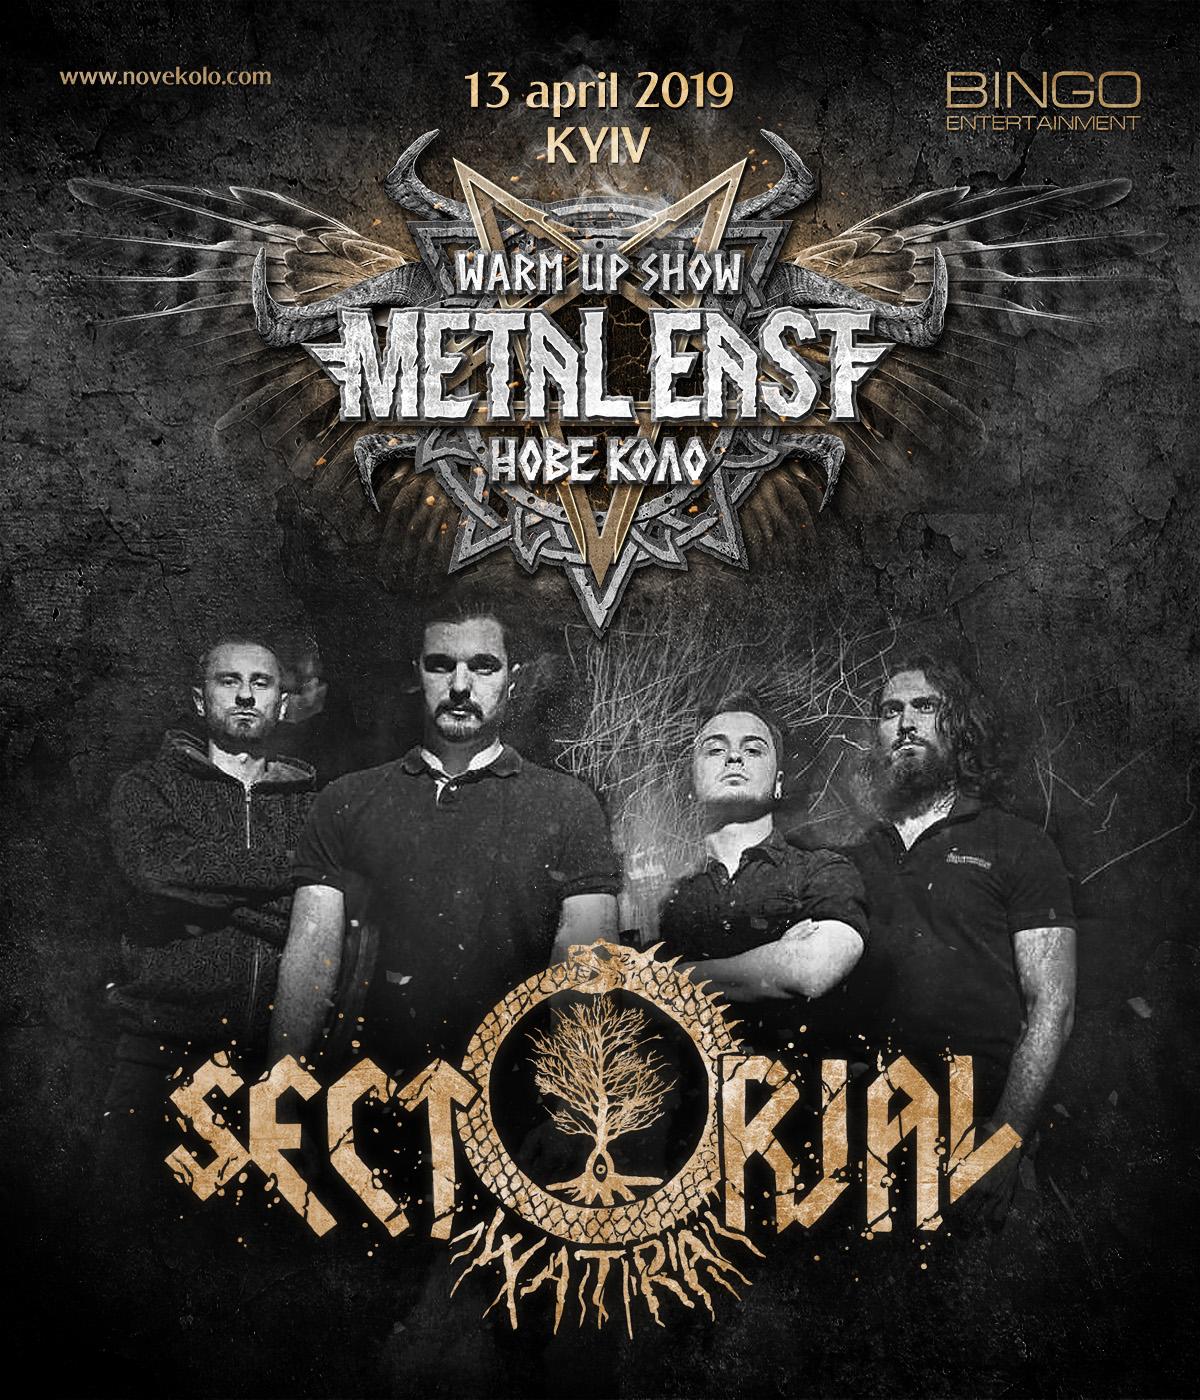 "Гурт SECTORIAL на Metal East Нове Коло warm-up шоу в київському клубі ""Бінго"""